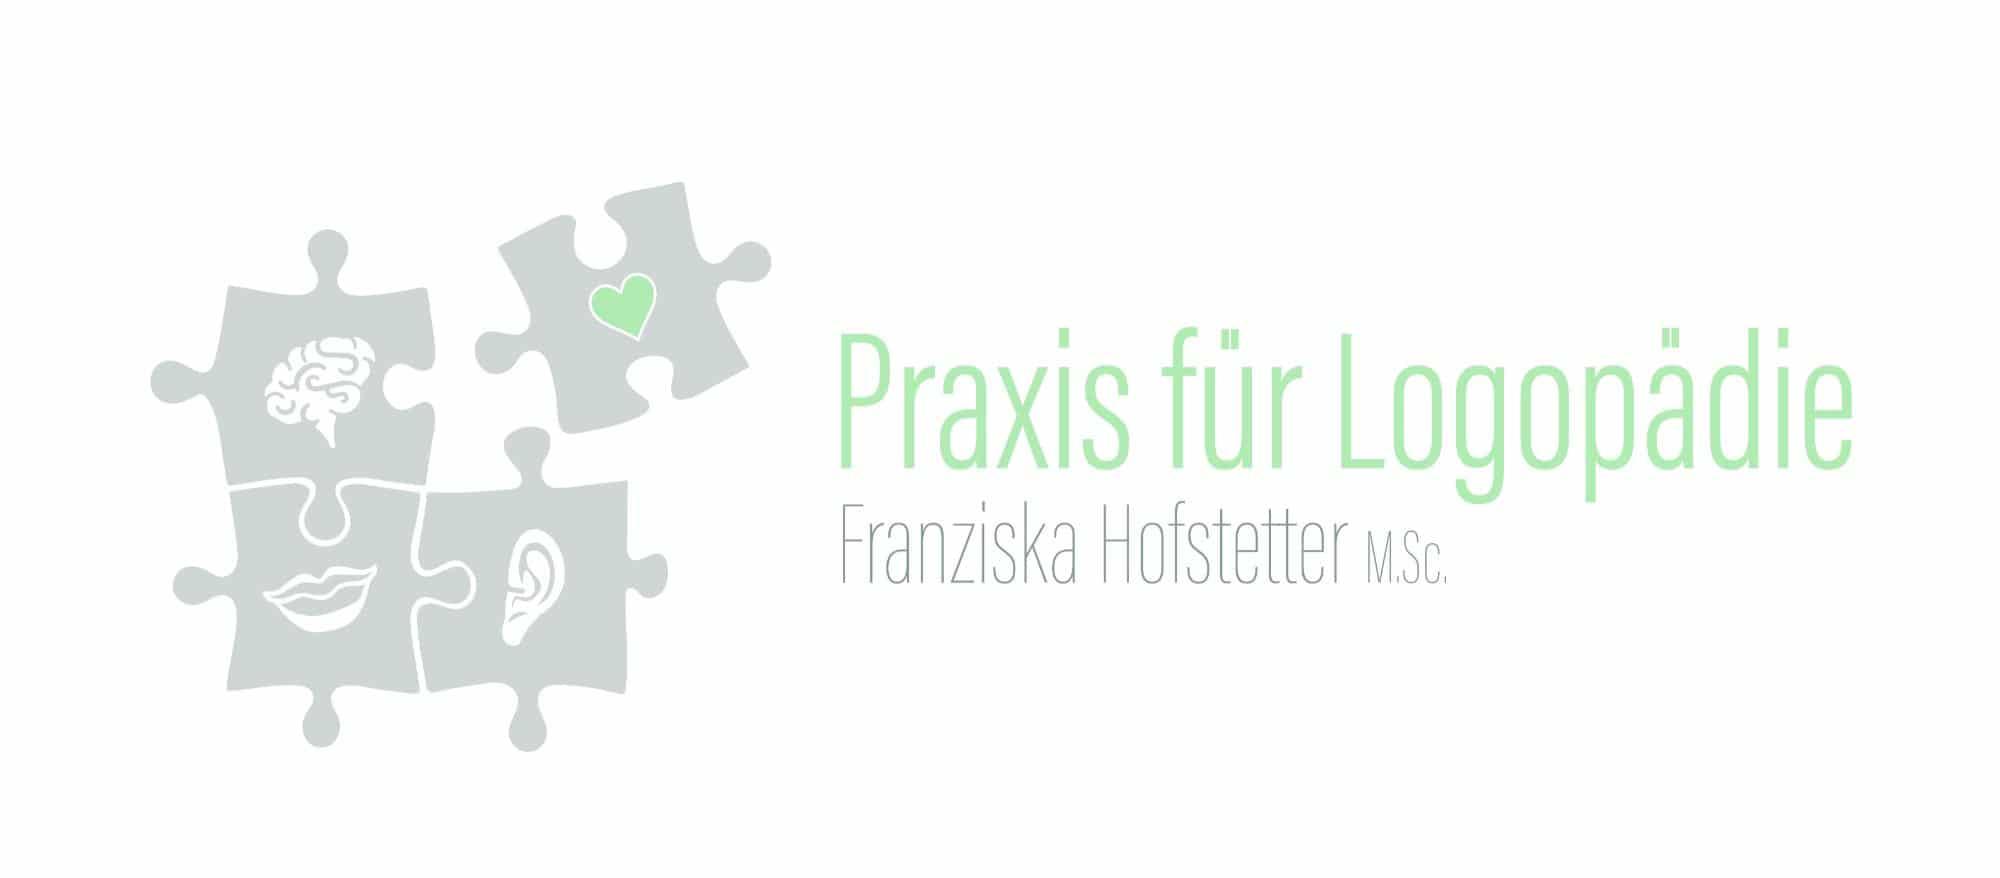 Praxis für Logopädie Franziska Hofstetter